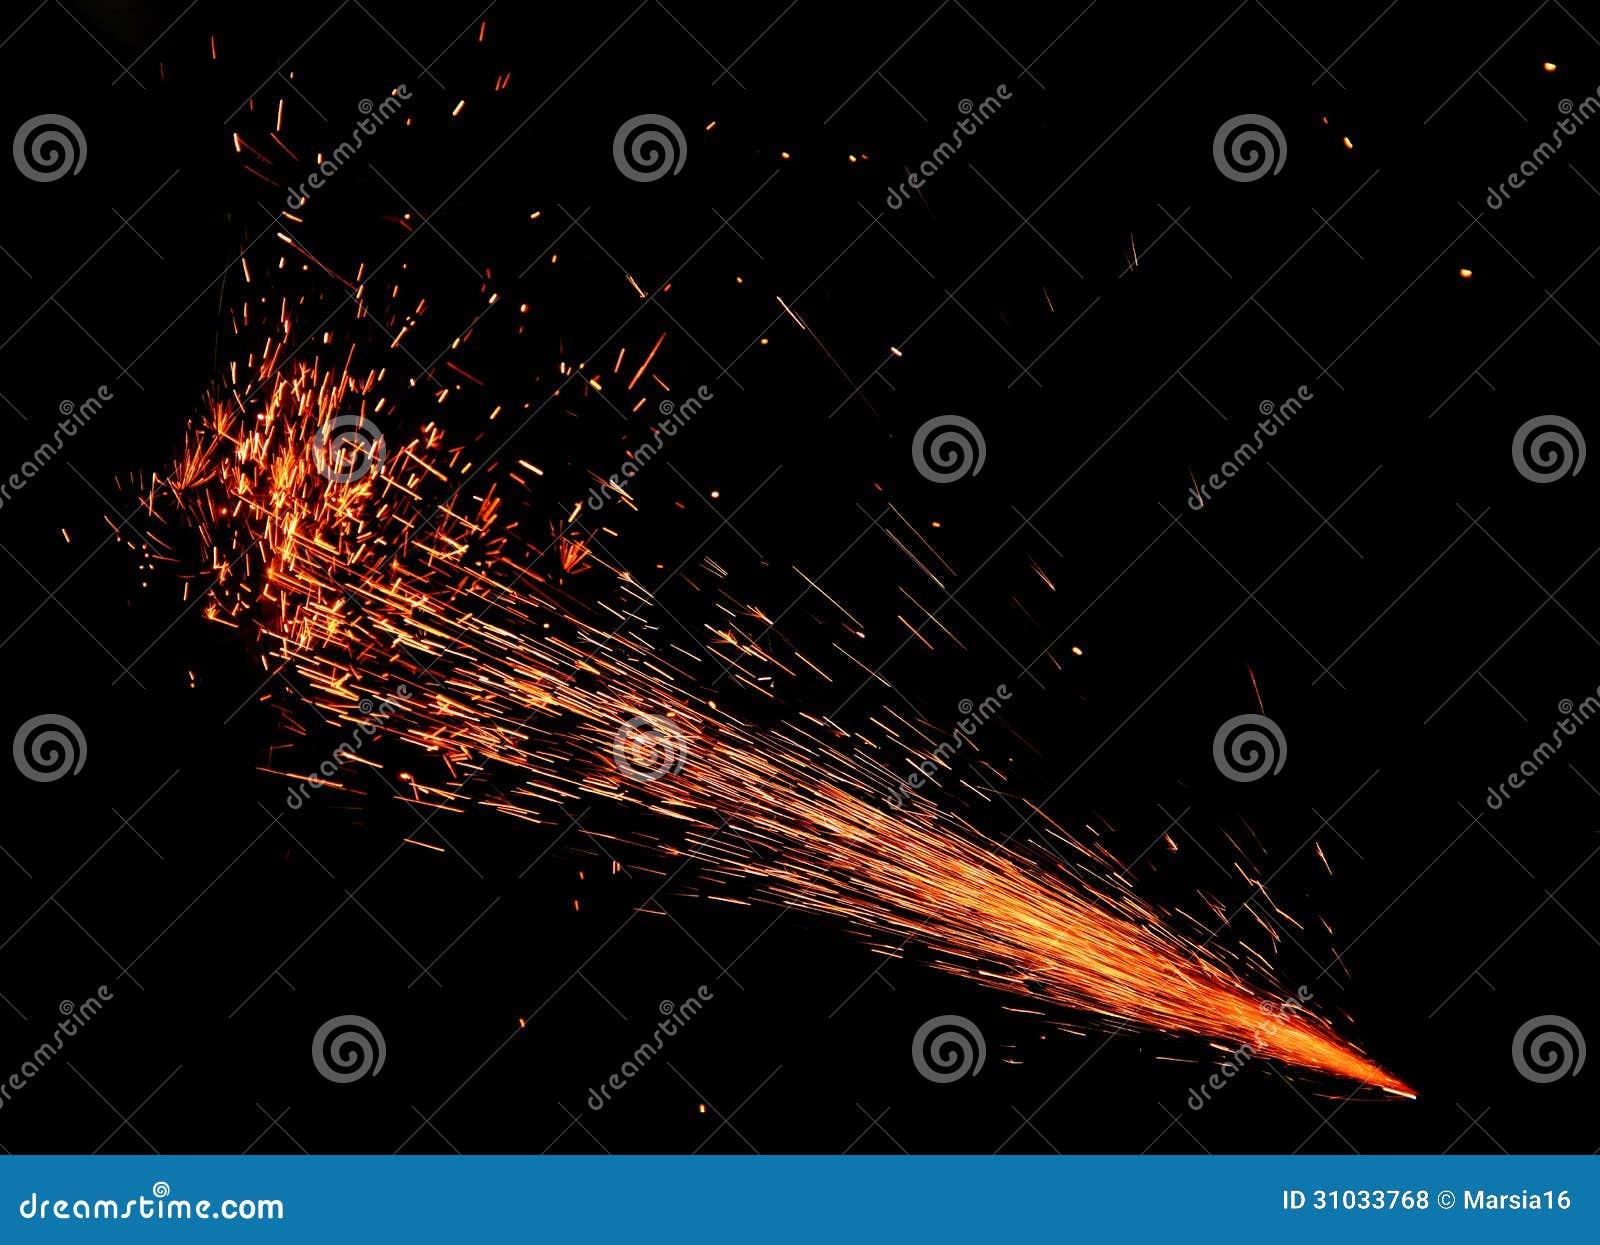 Sparks of Fire on Black